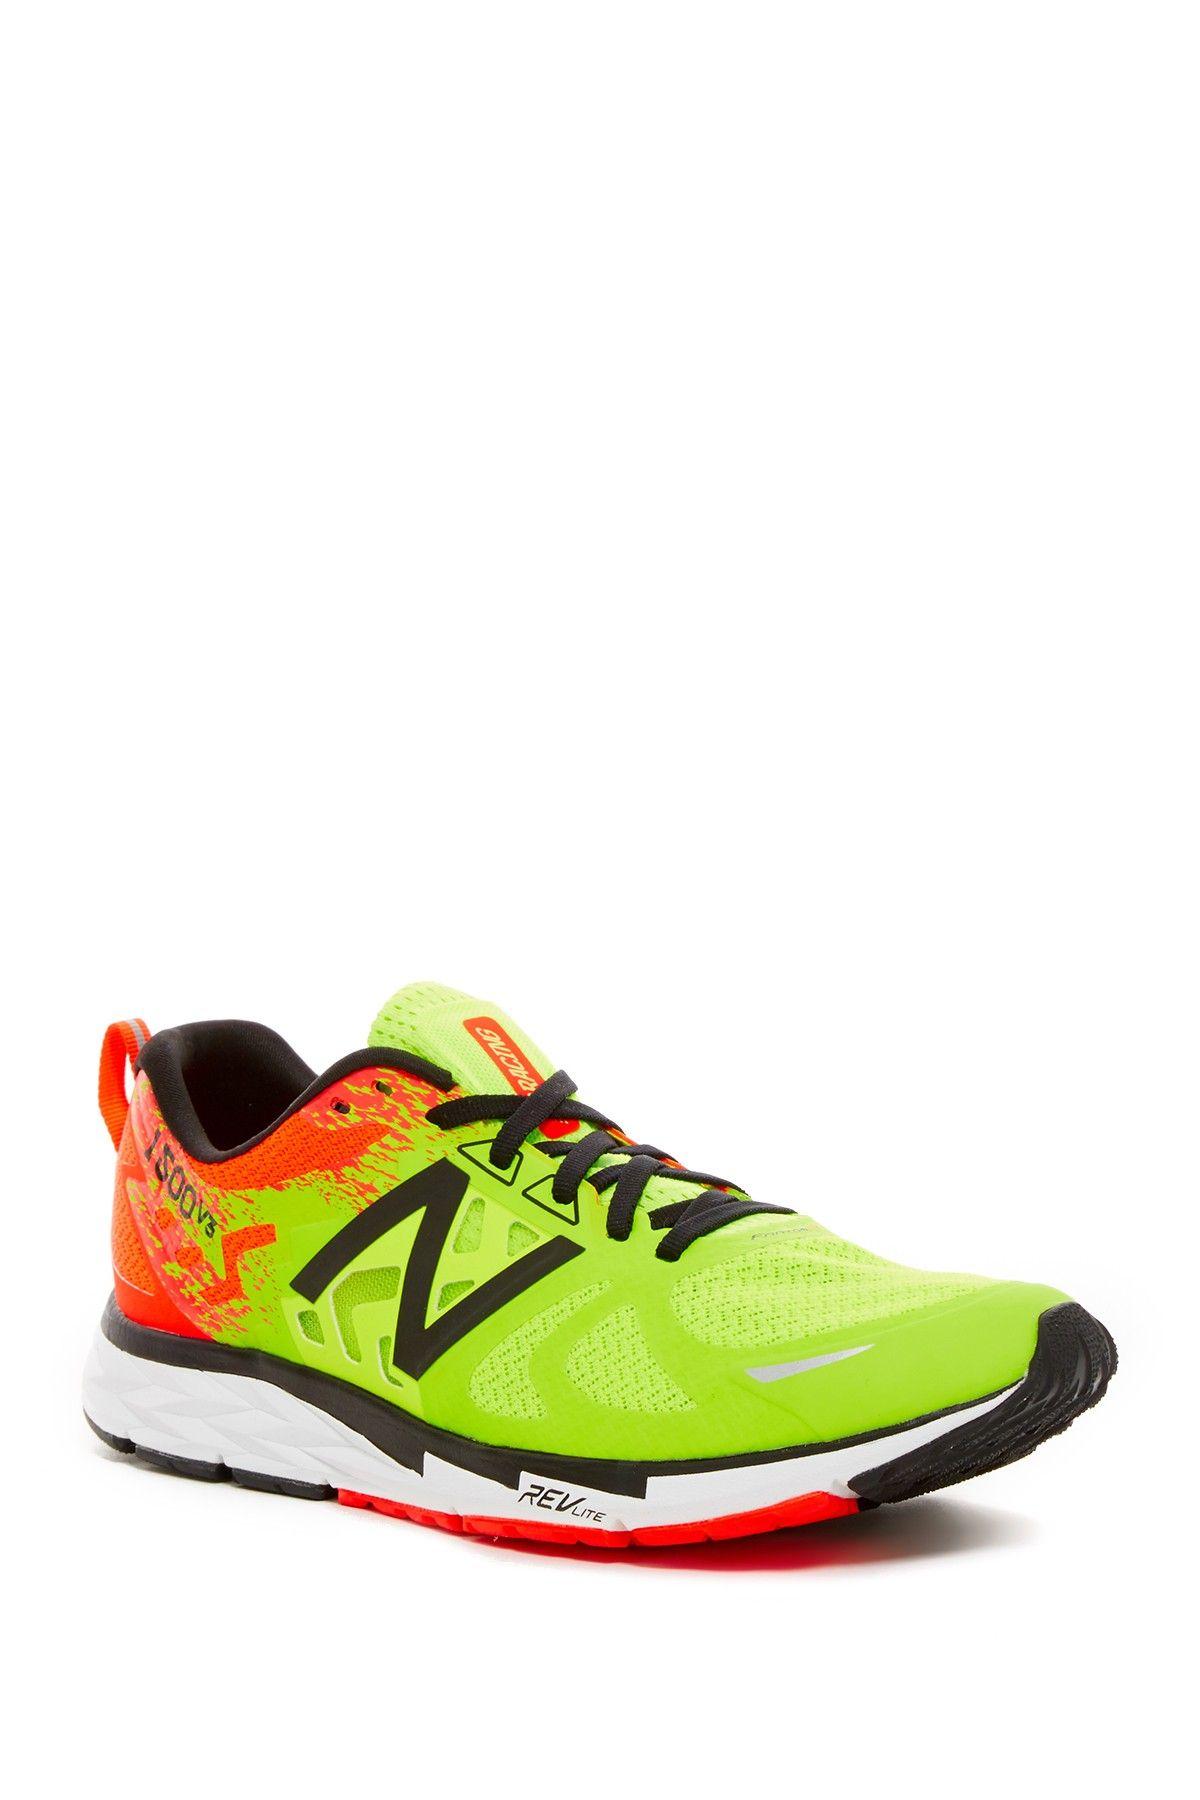 1500 v3 Running Shoe | Mens fashion dressy, Running shoes, Mens ...